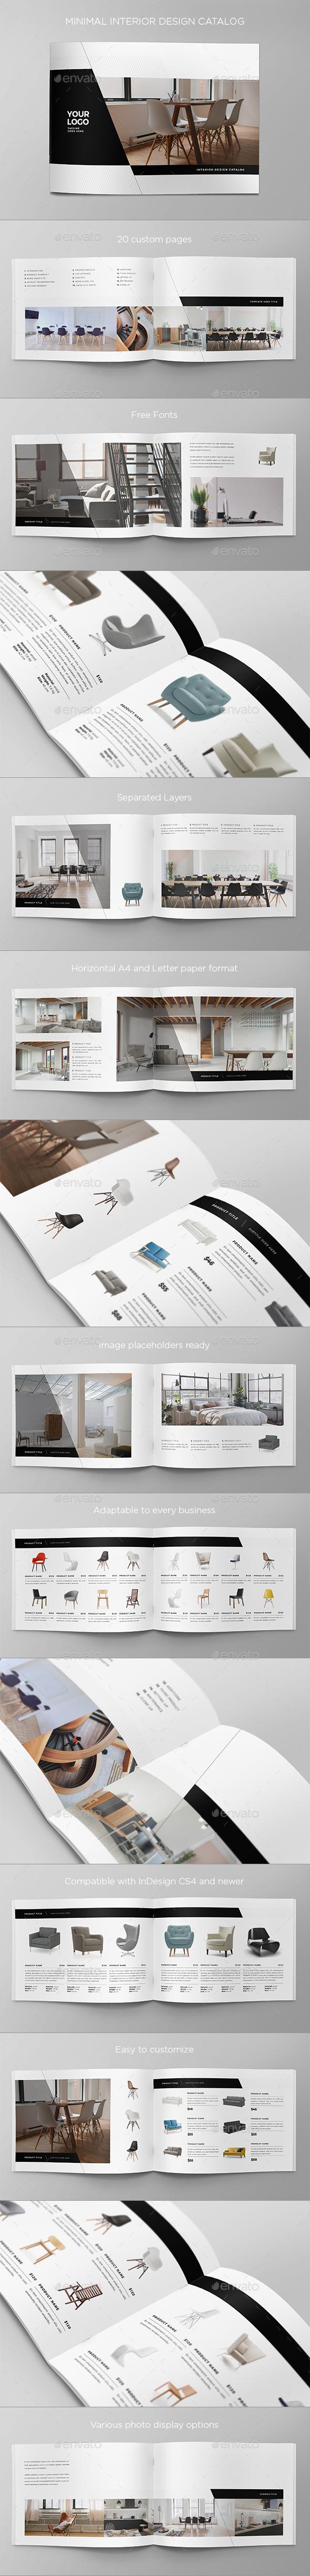 Minimal Interior Design Catalog - Catalogs Brochures